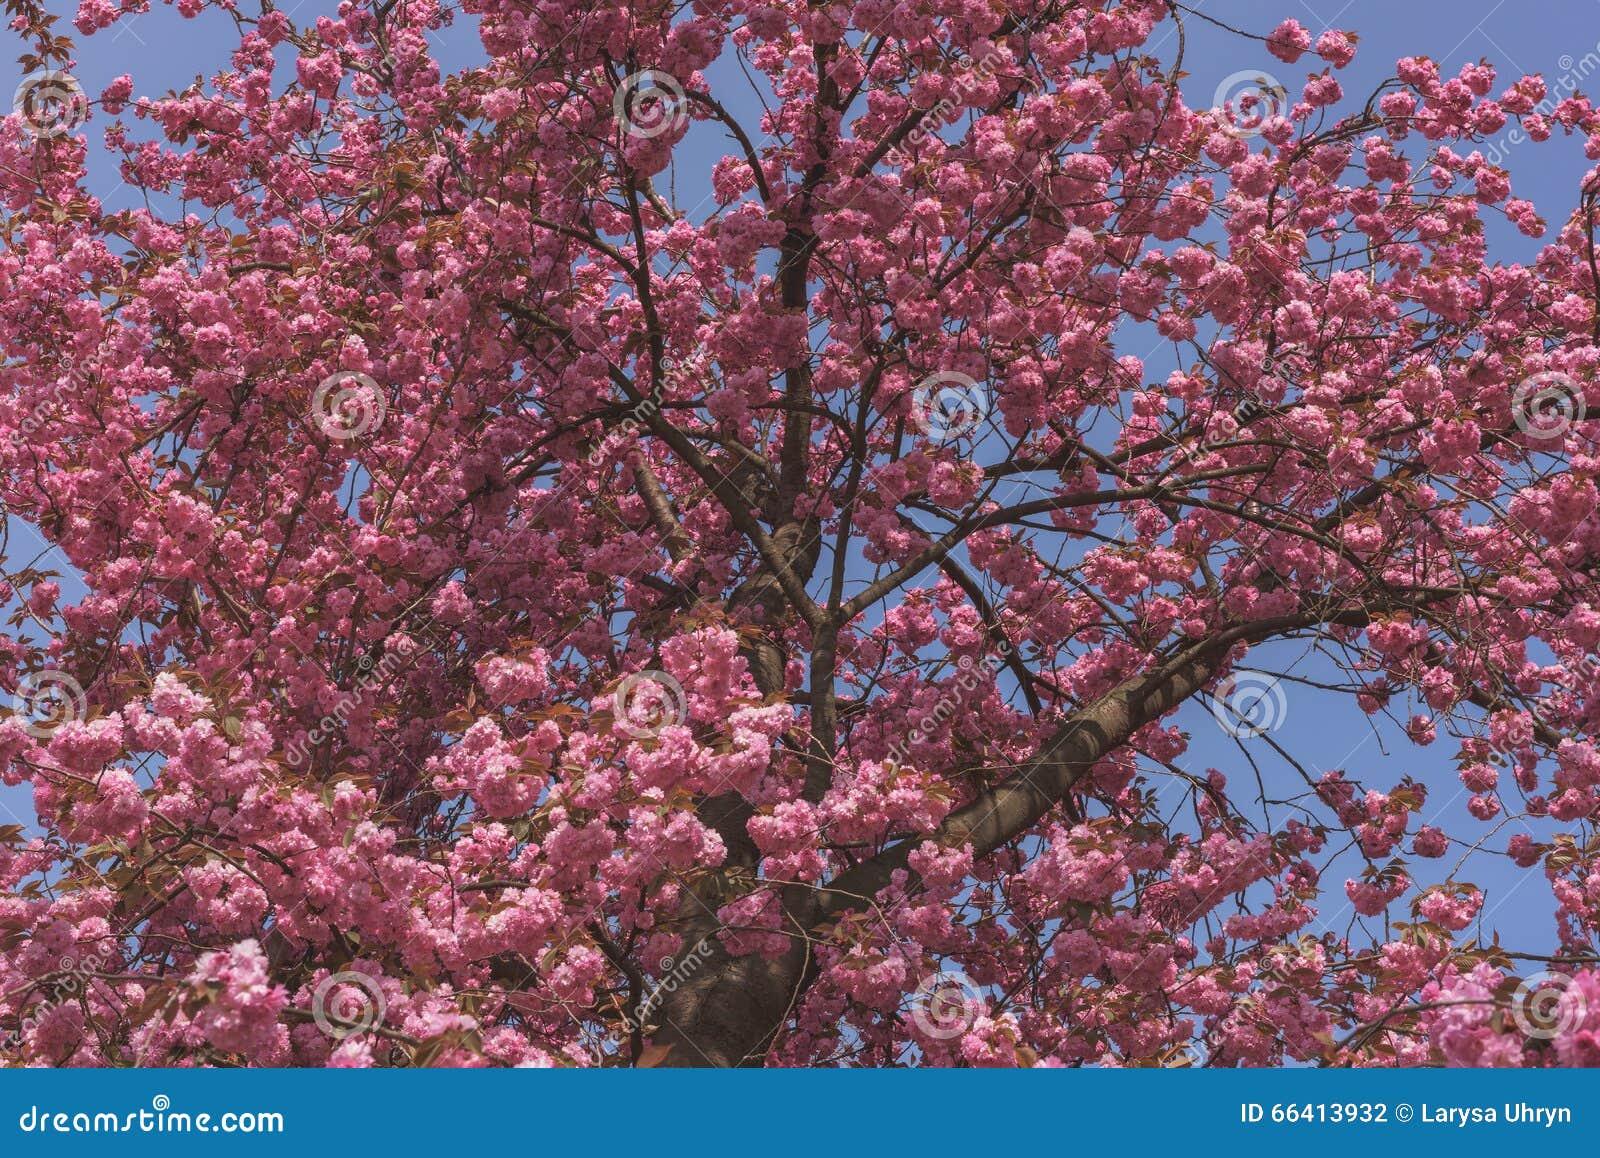 Pink Blooming Sakura Tree With Blue Sky Stock Photo Image Of